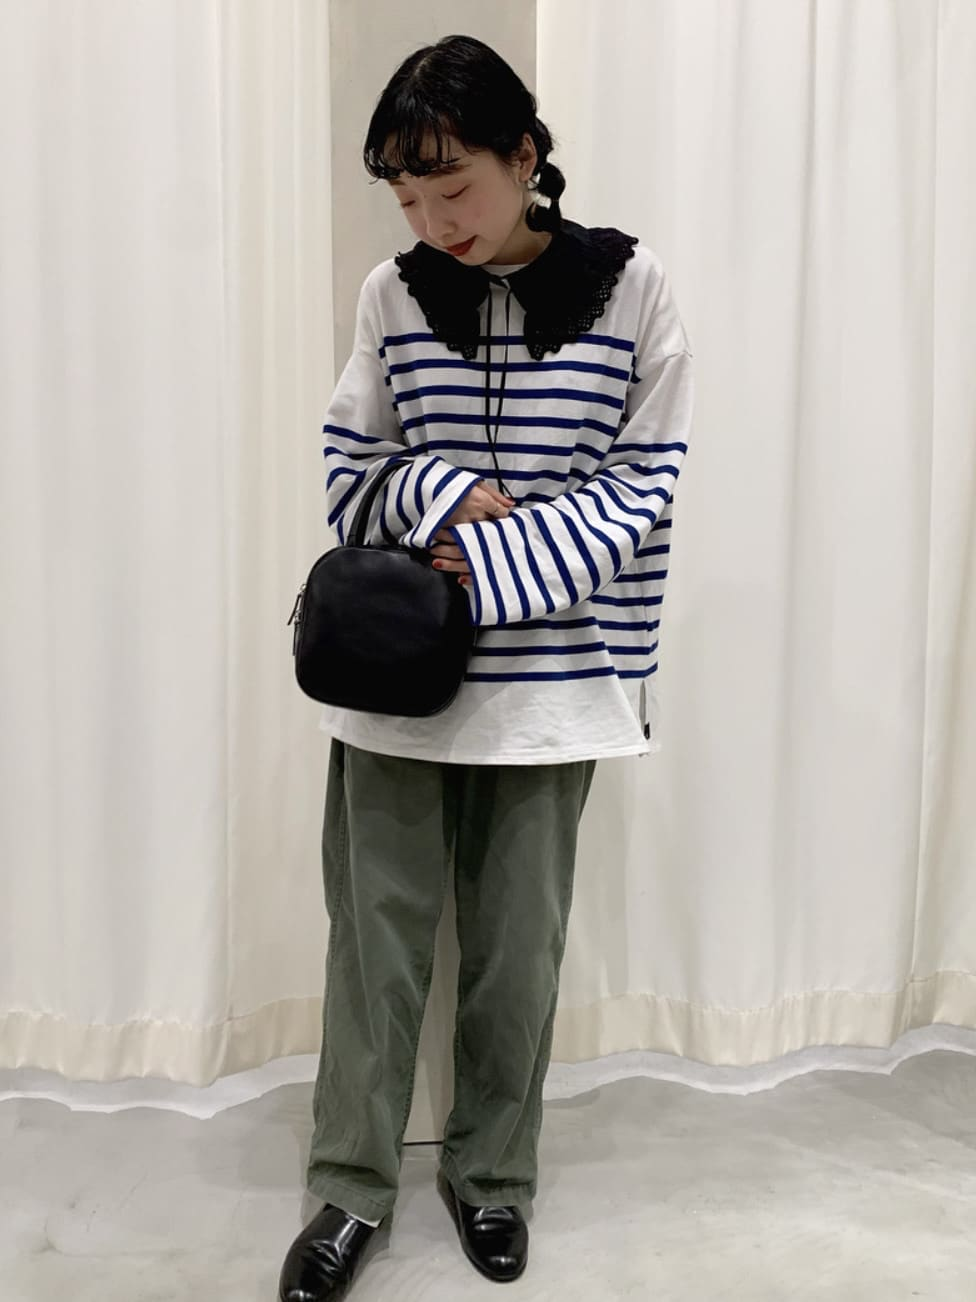 - CHILD WOMAN CHILD WOMAN , PAR ICI ルミネ横浜 身長:157cm 2021.09.05